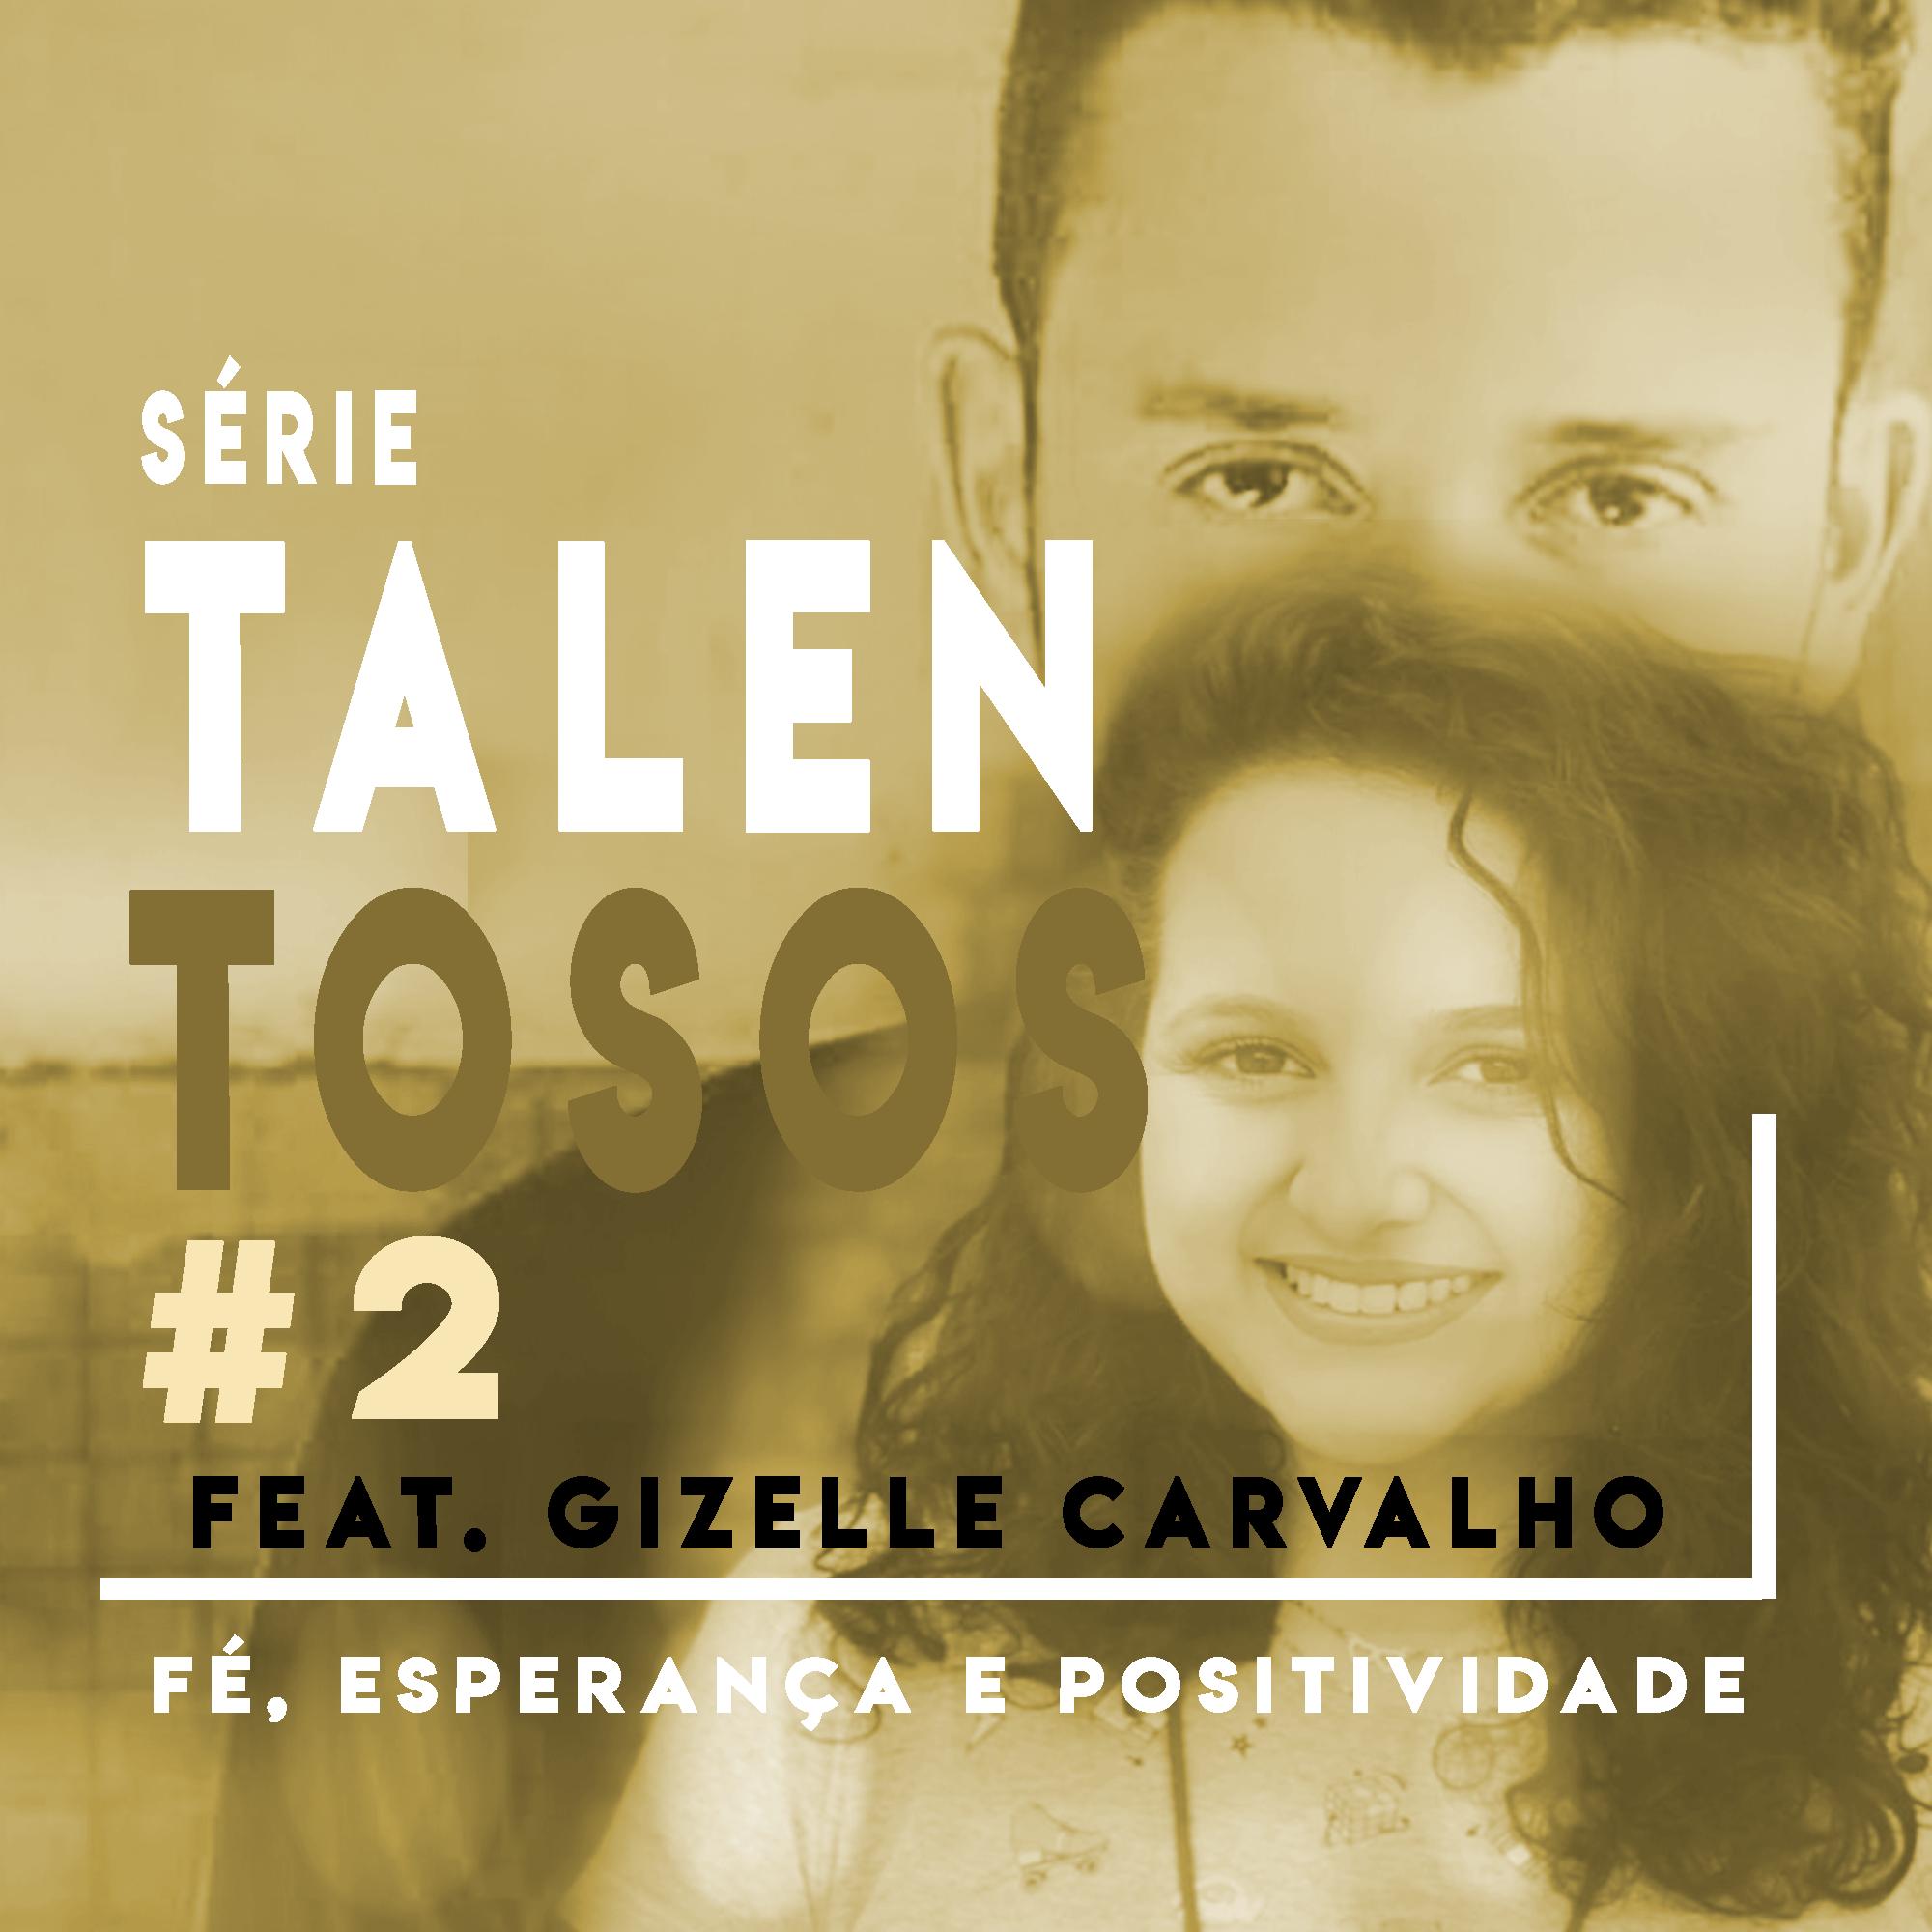 #2 A Beleza vem de Deus ft. Gizelle Carvalho